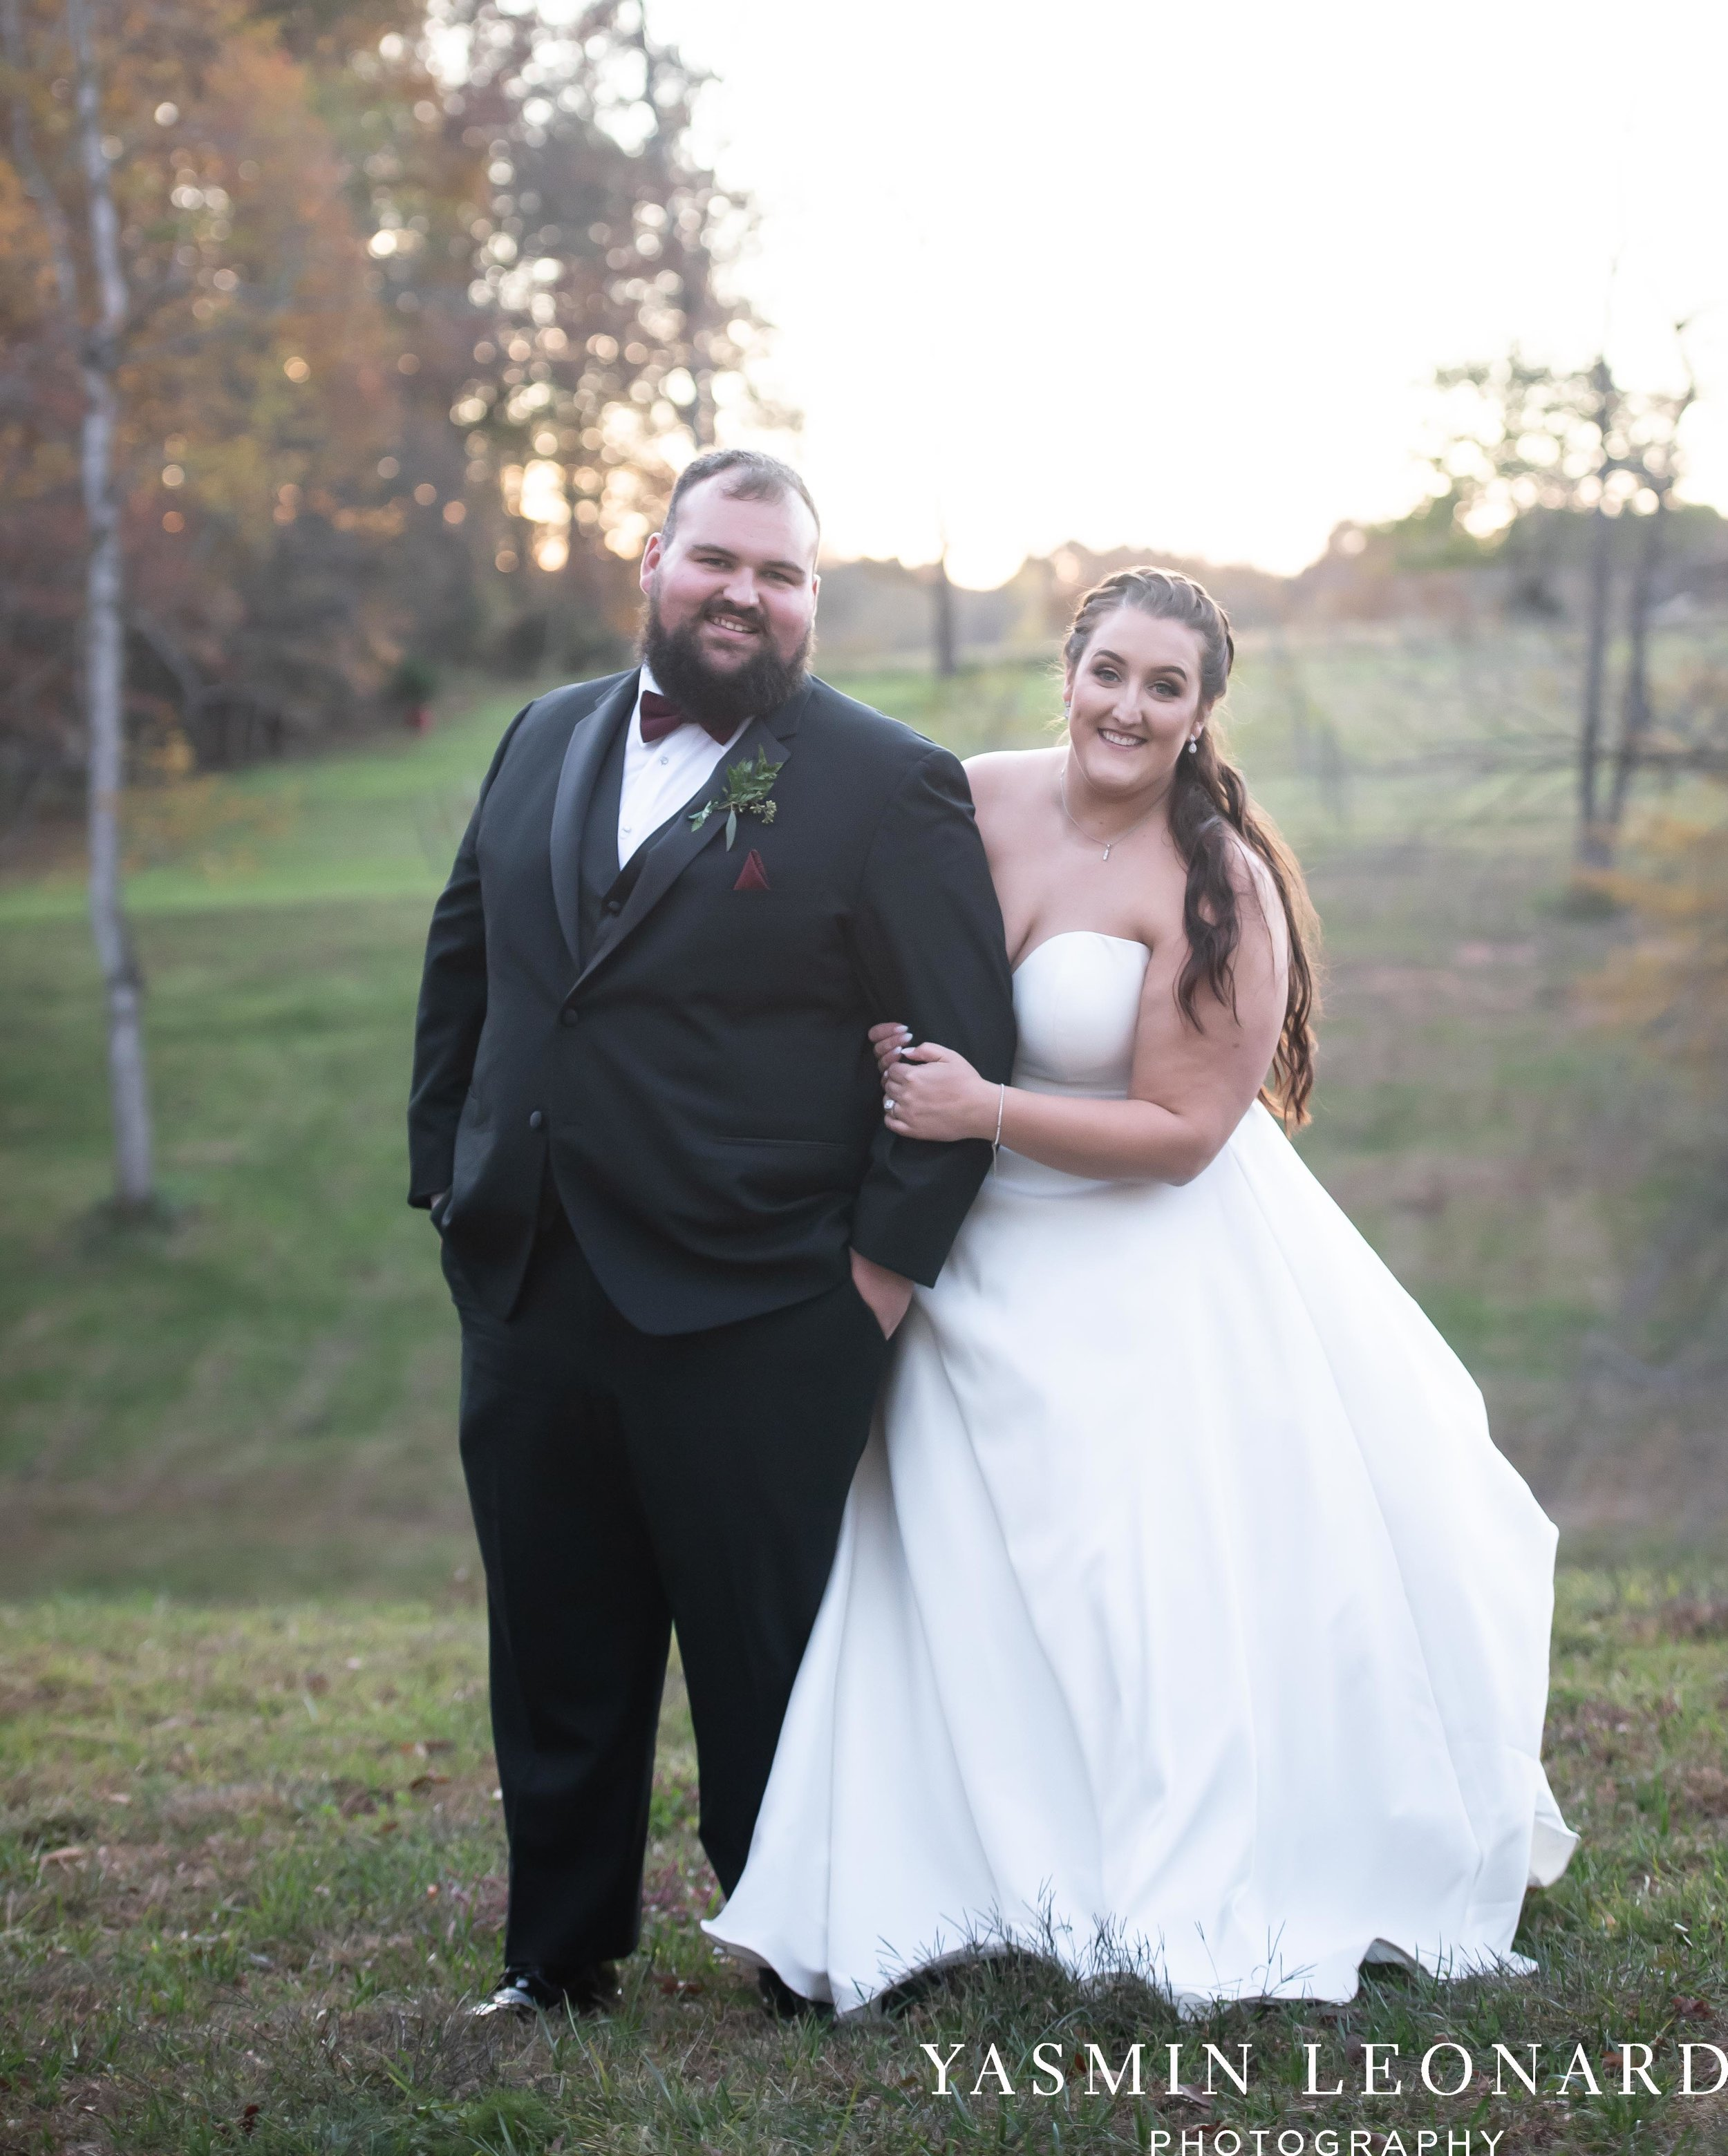 Wesley Memorial United Methodist Church - Old Homeplace Winery - High Point Weddings - High Point Wedding Photographer - NC Weddings - NC Barn Venue - Yasmin Leonard Photography-62.jpg